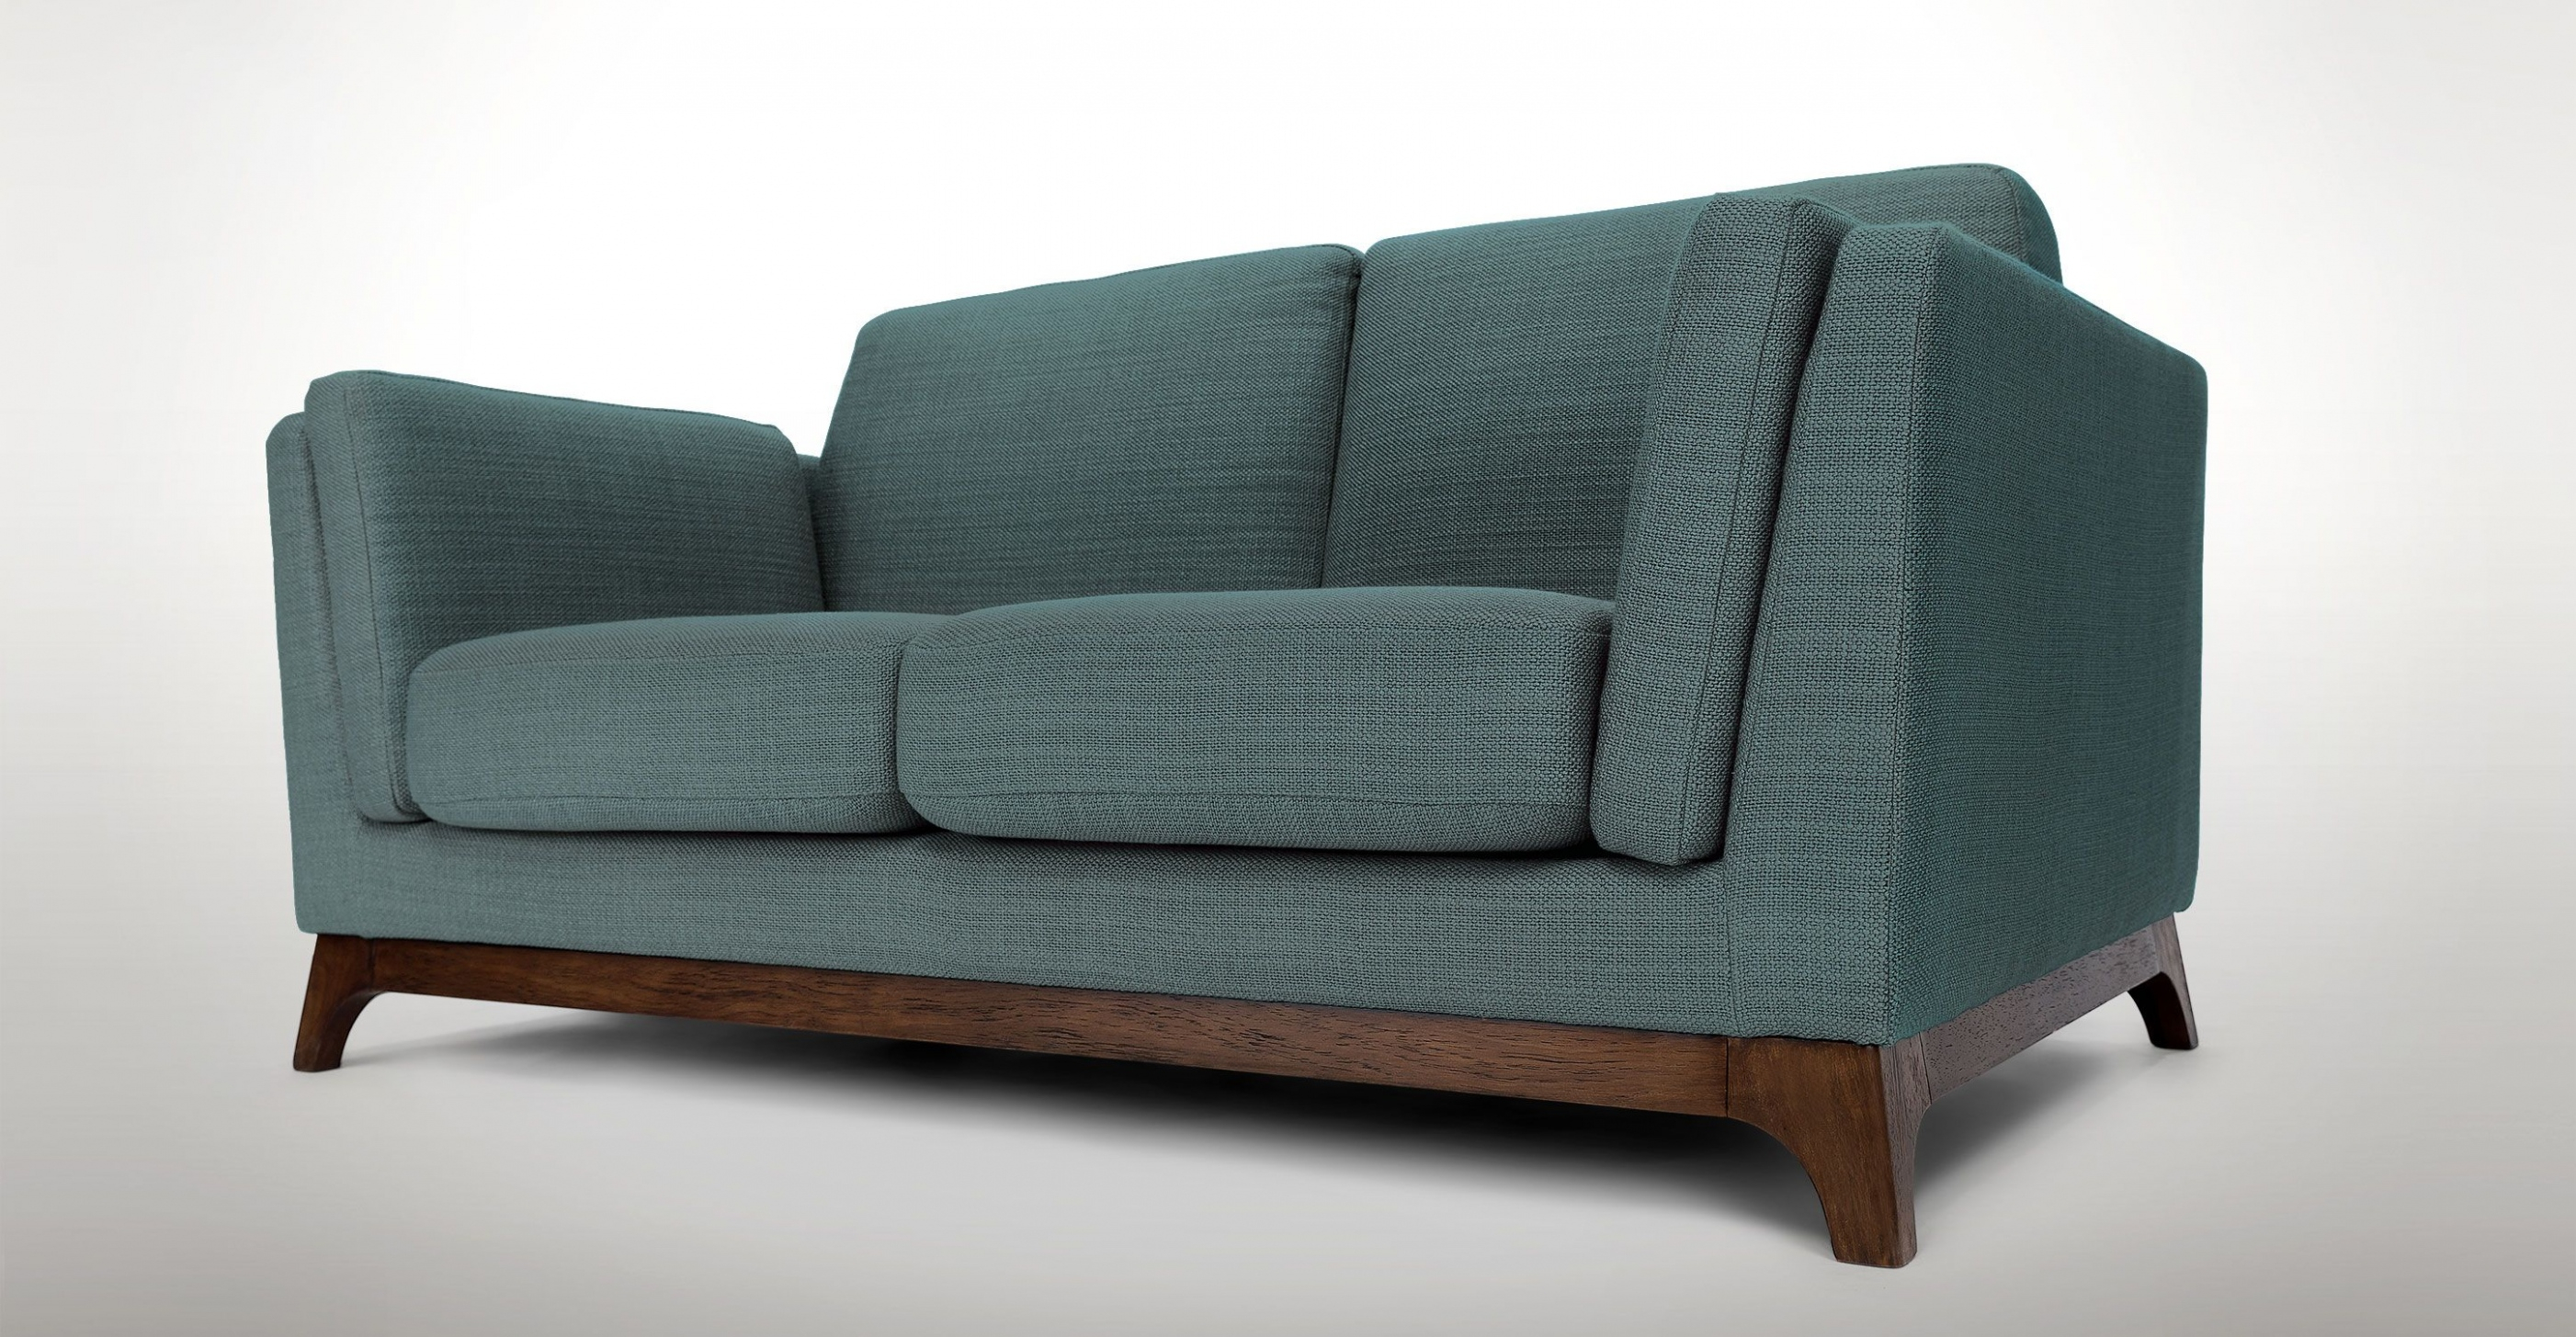 Madison Mid Century Modern Sofa Living Room Furniture Assorted In Aquarius Dark Grey Sofa Chairs (View 22 of 25)